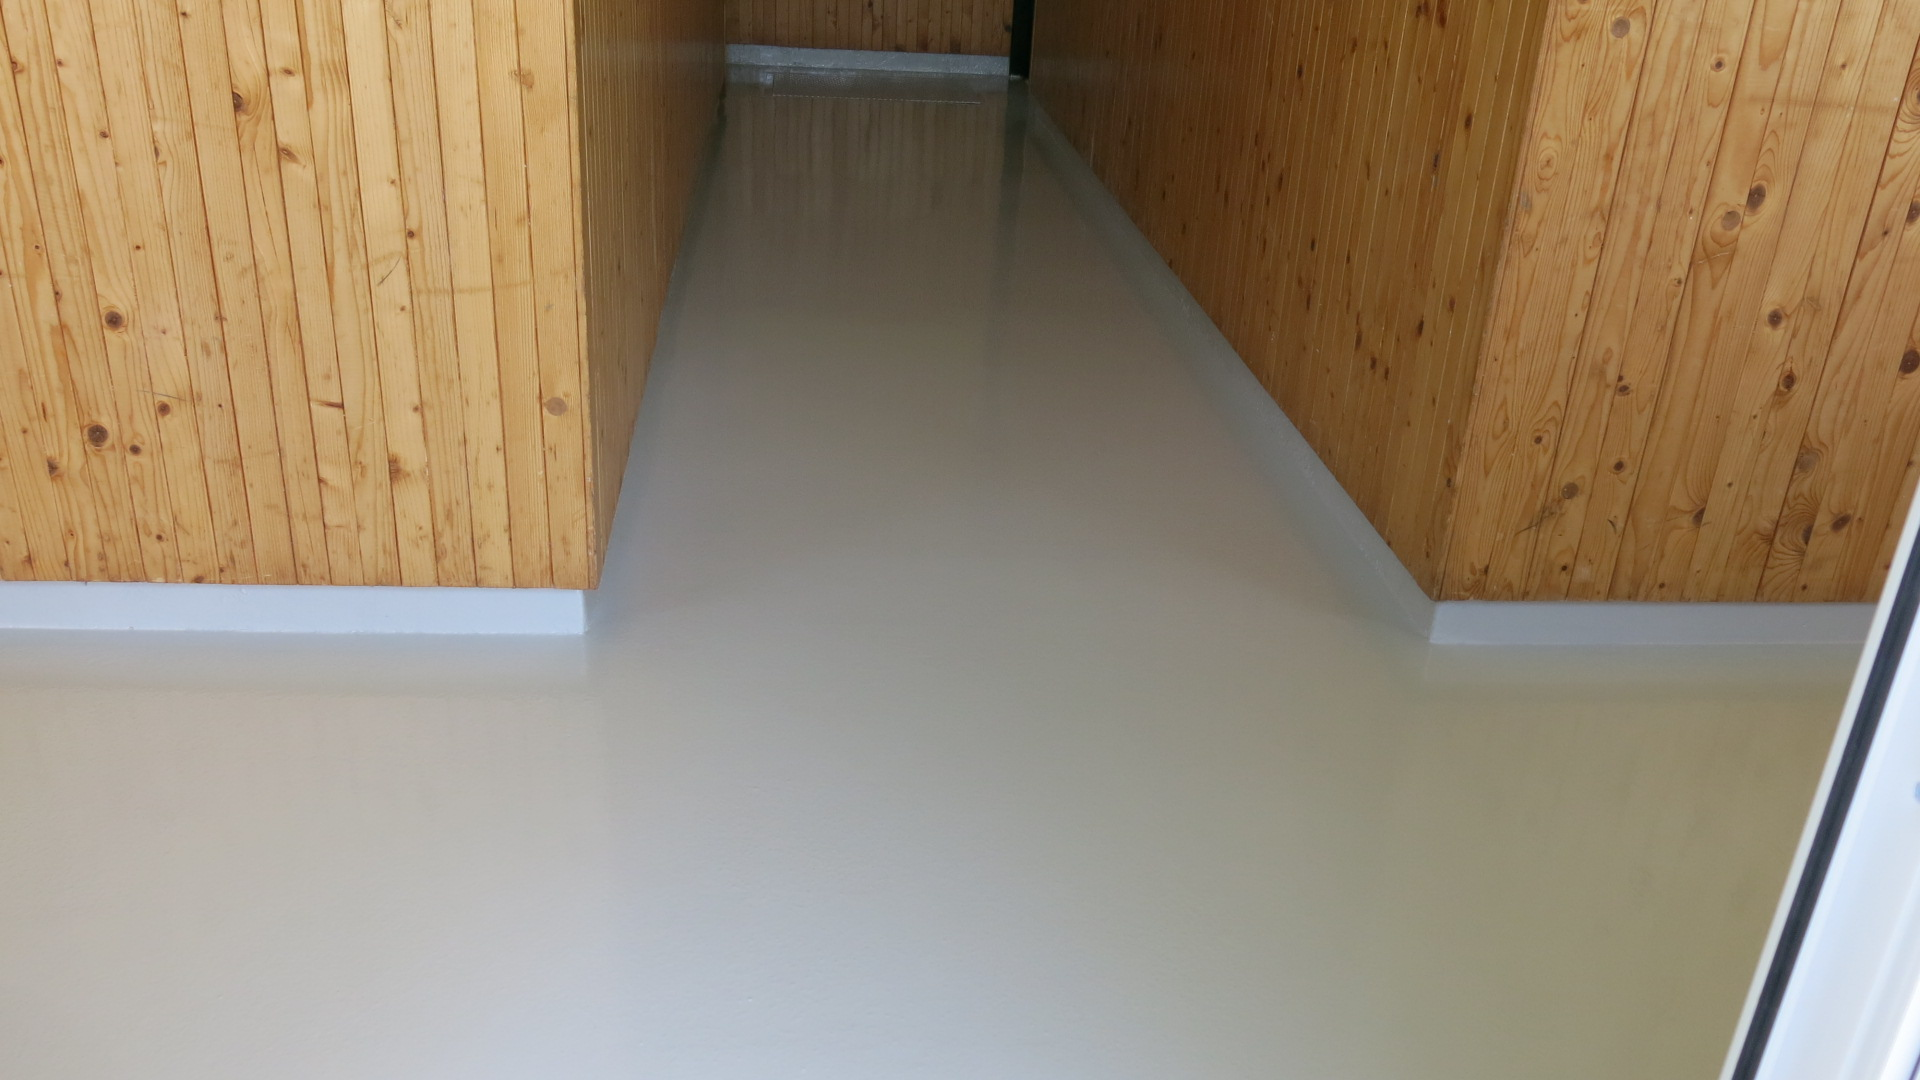 Lité podlahy do hygienicky náročných objektů